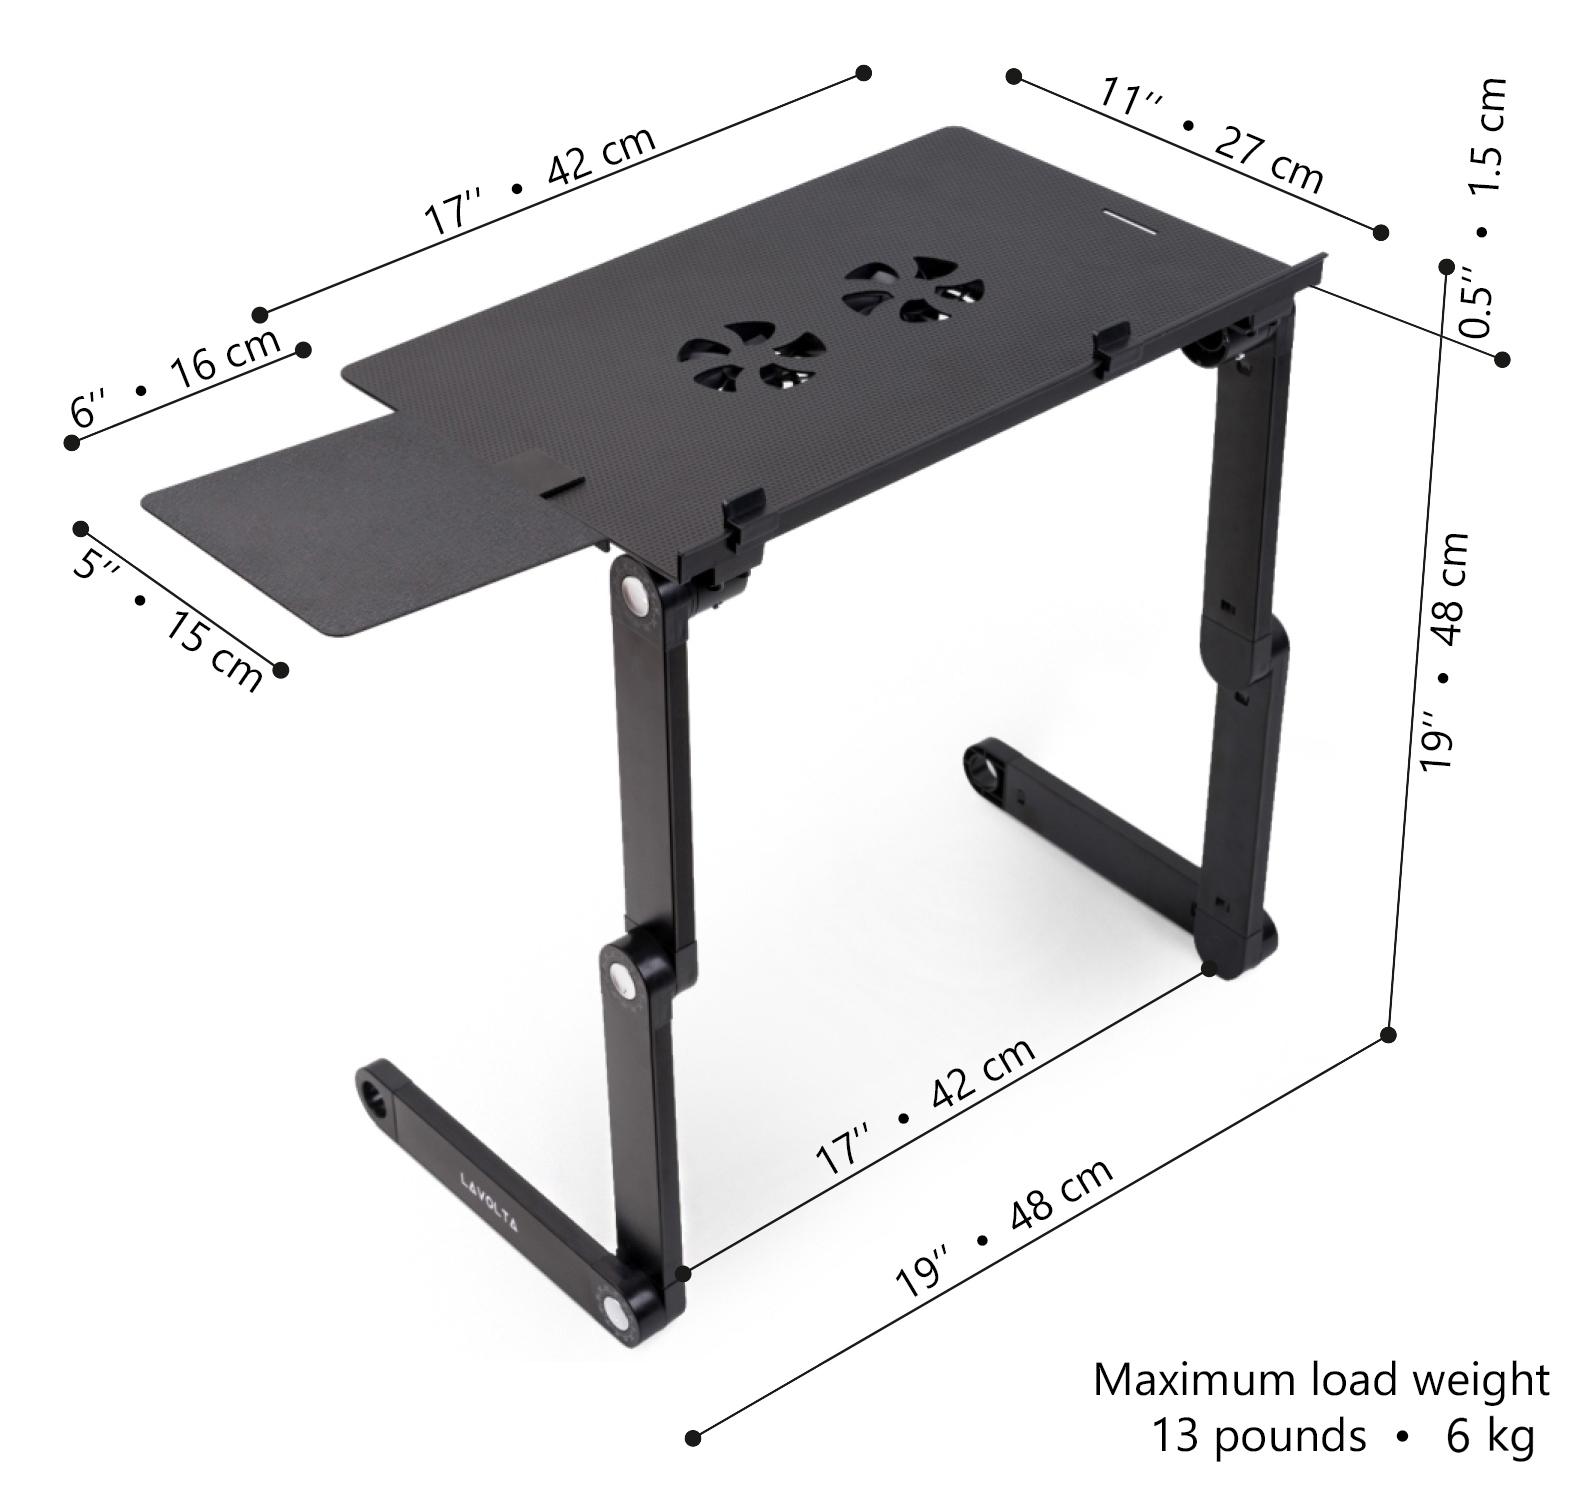 lavolta notebook laptop st nder tisch k hler mit mauspad 2x l fter schwarz ebay. Black Bedroom Furniture Sets. Home Design Ideas